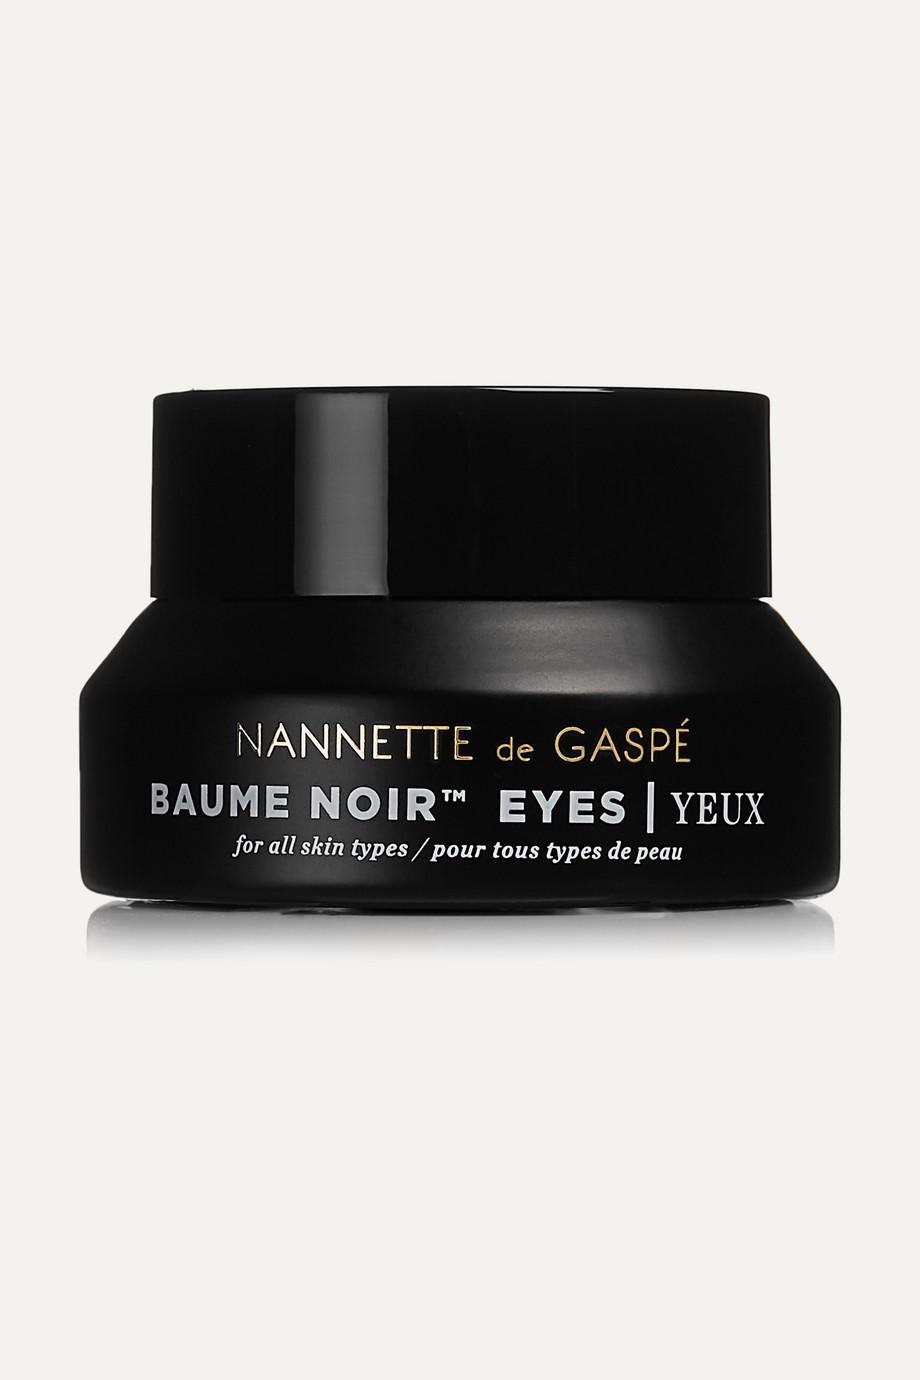 Nannette de Gaspé Art of Noir - Baume Noir Eyes, 15ml